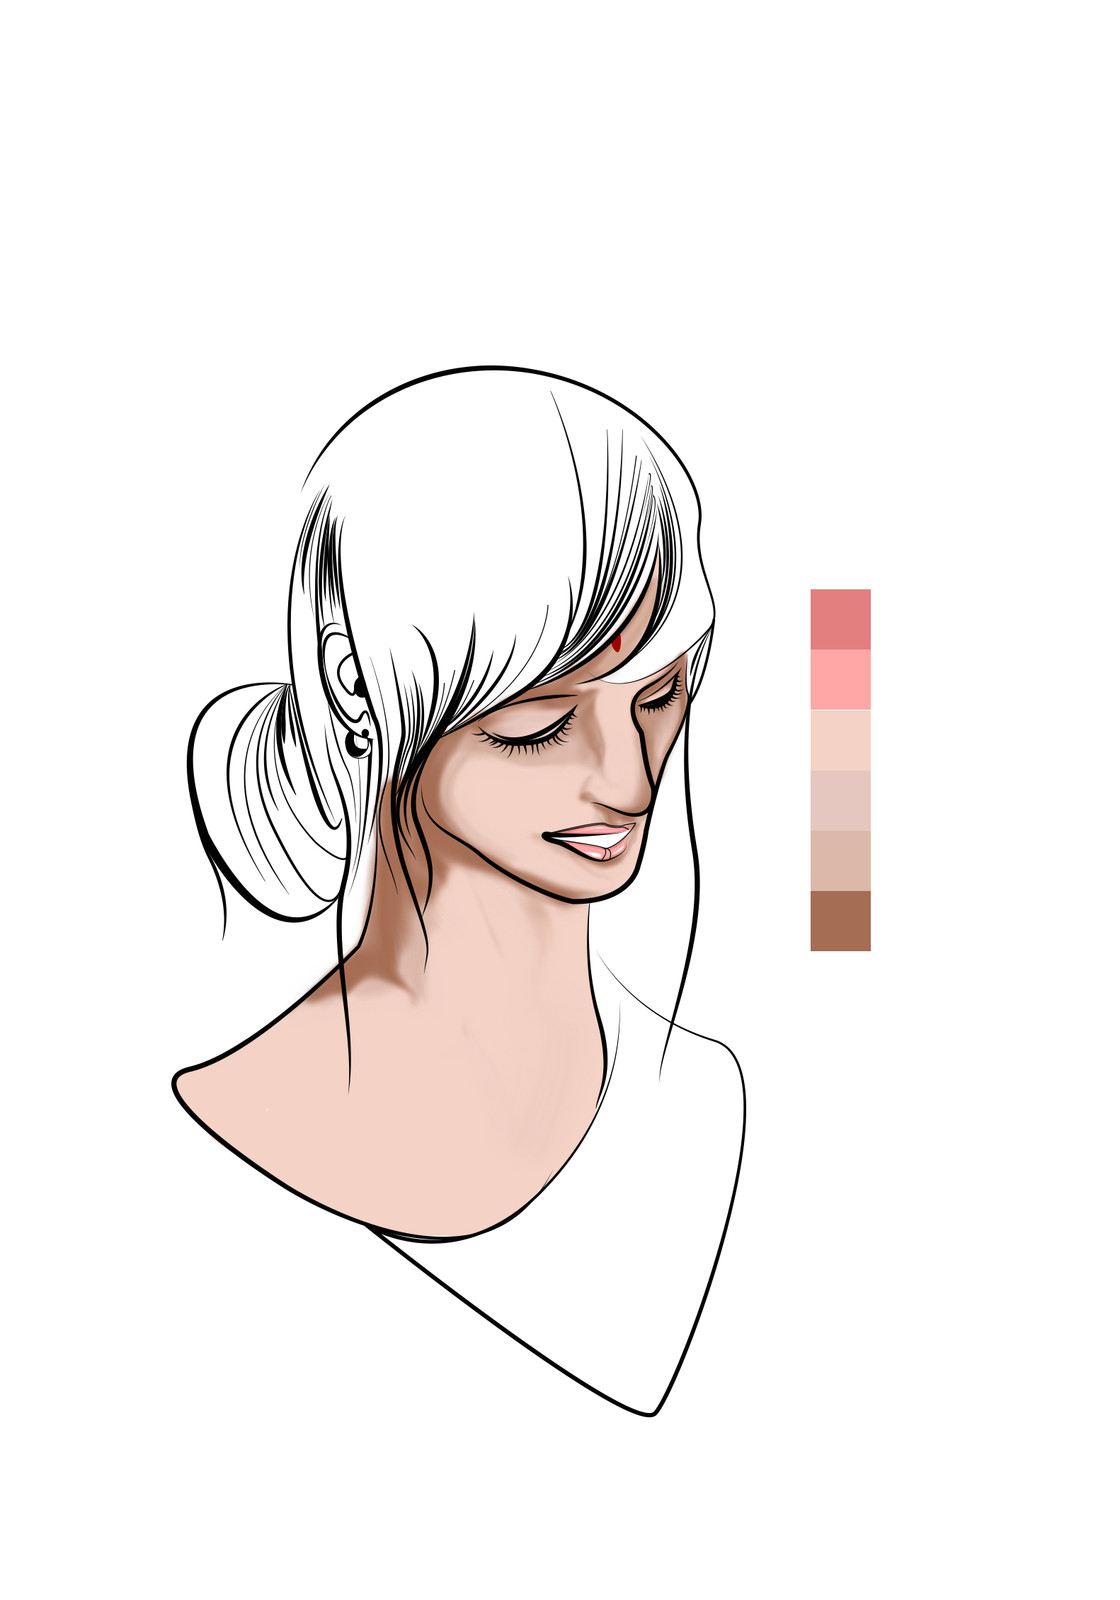 seven - Base coloring more detail (Skin)